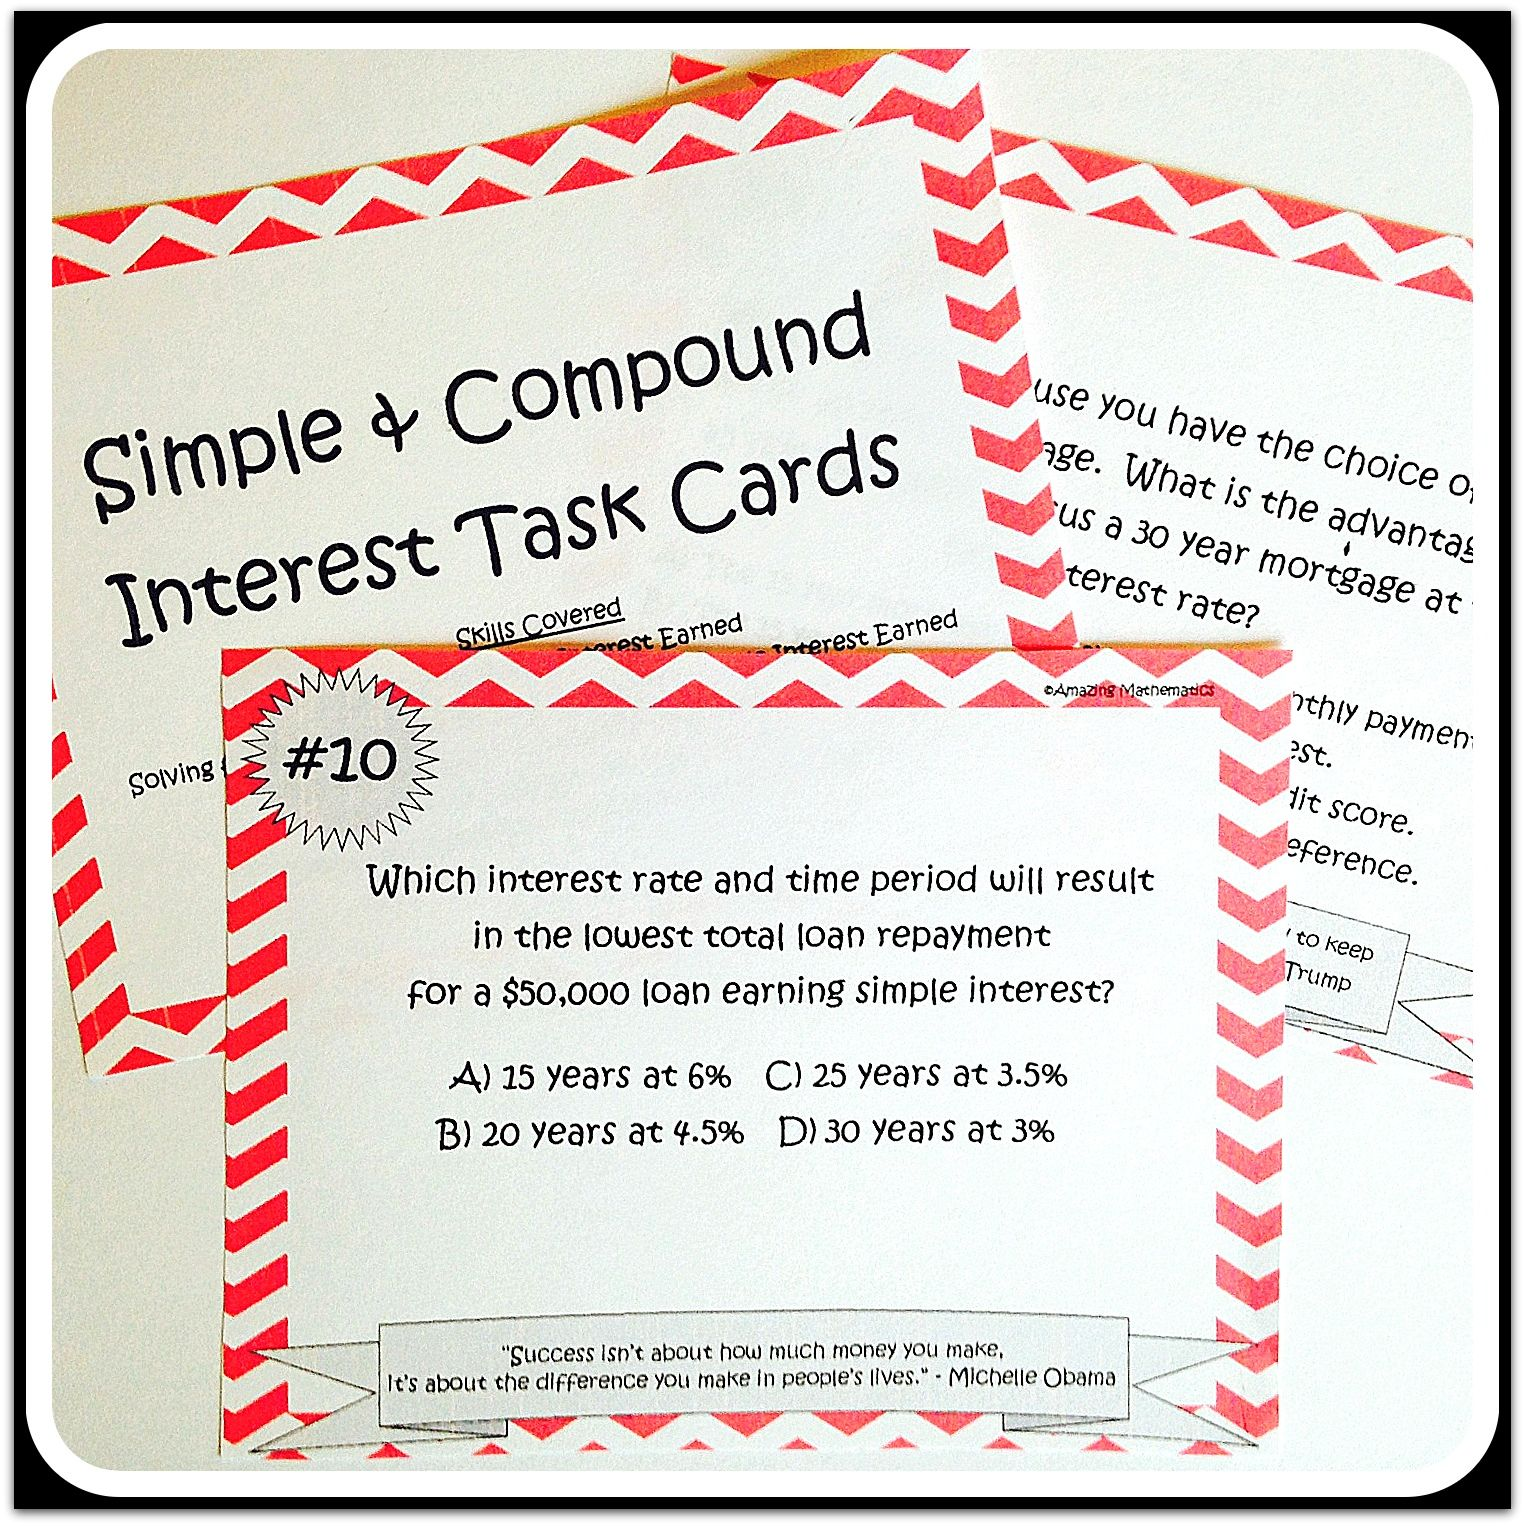 Simple Amp Compound Interest Task Cards